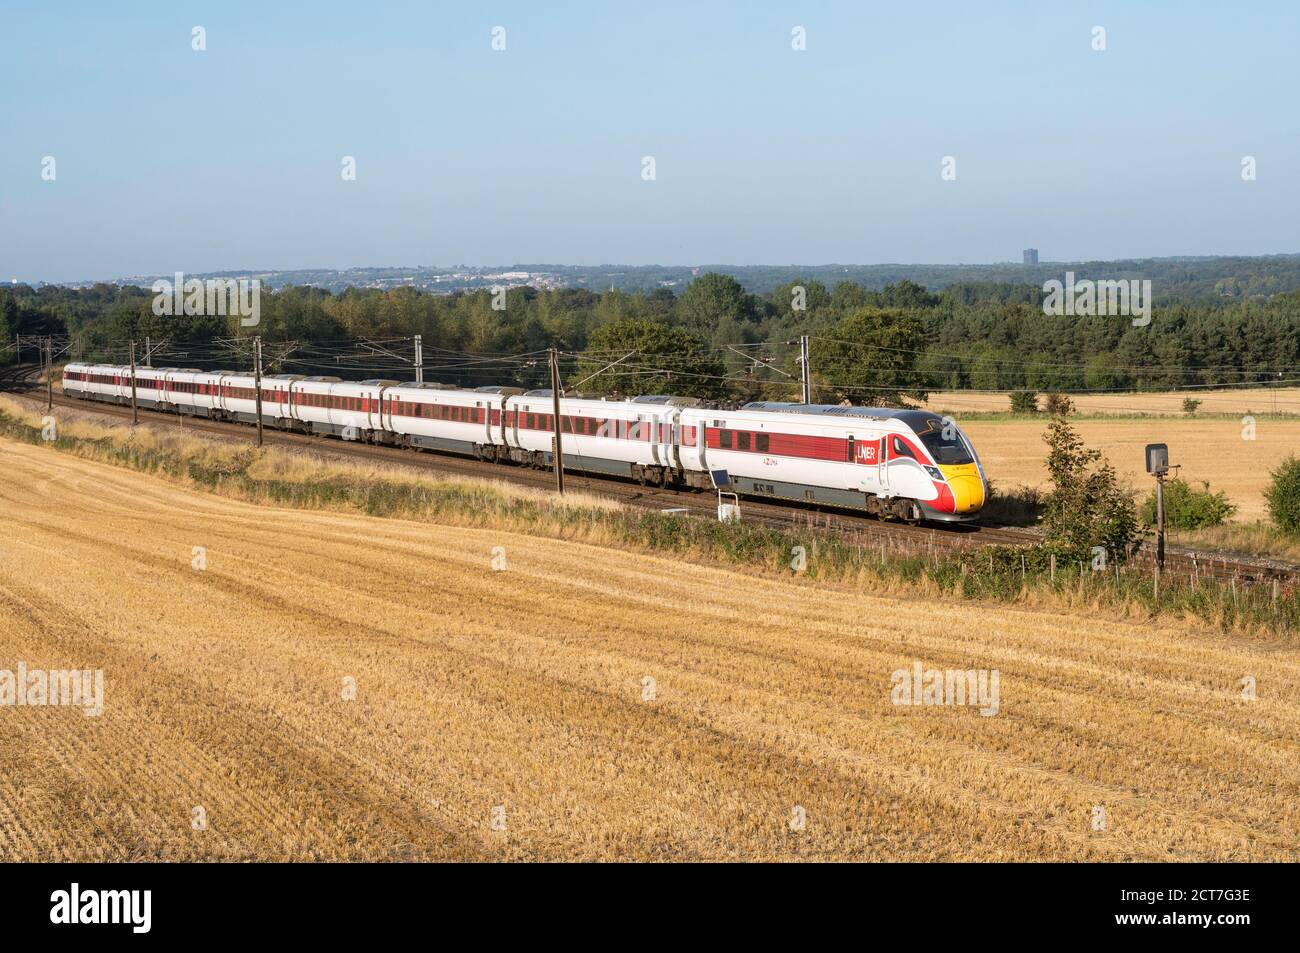 lner-hitachi-azuma-express-passenger-tra